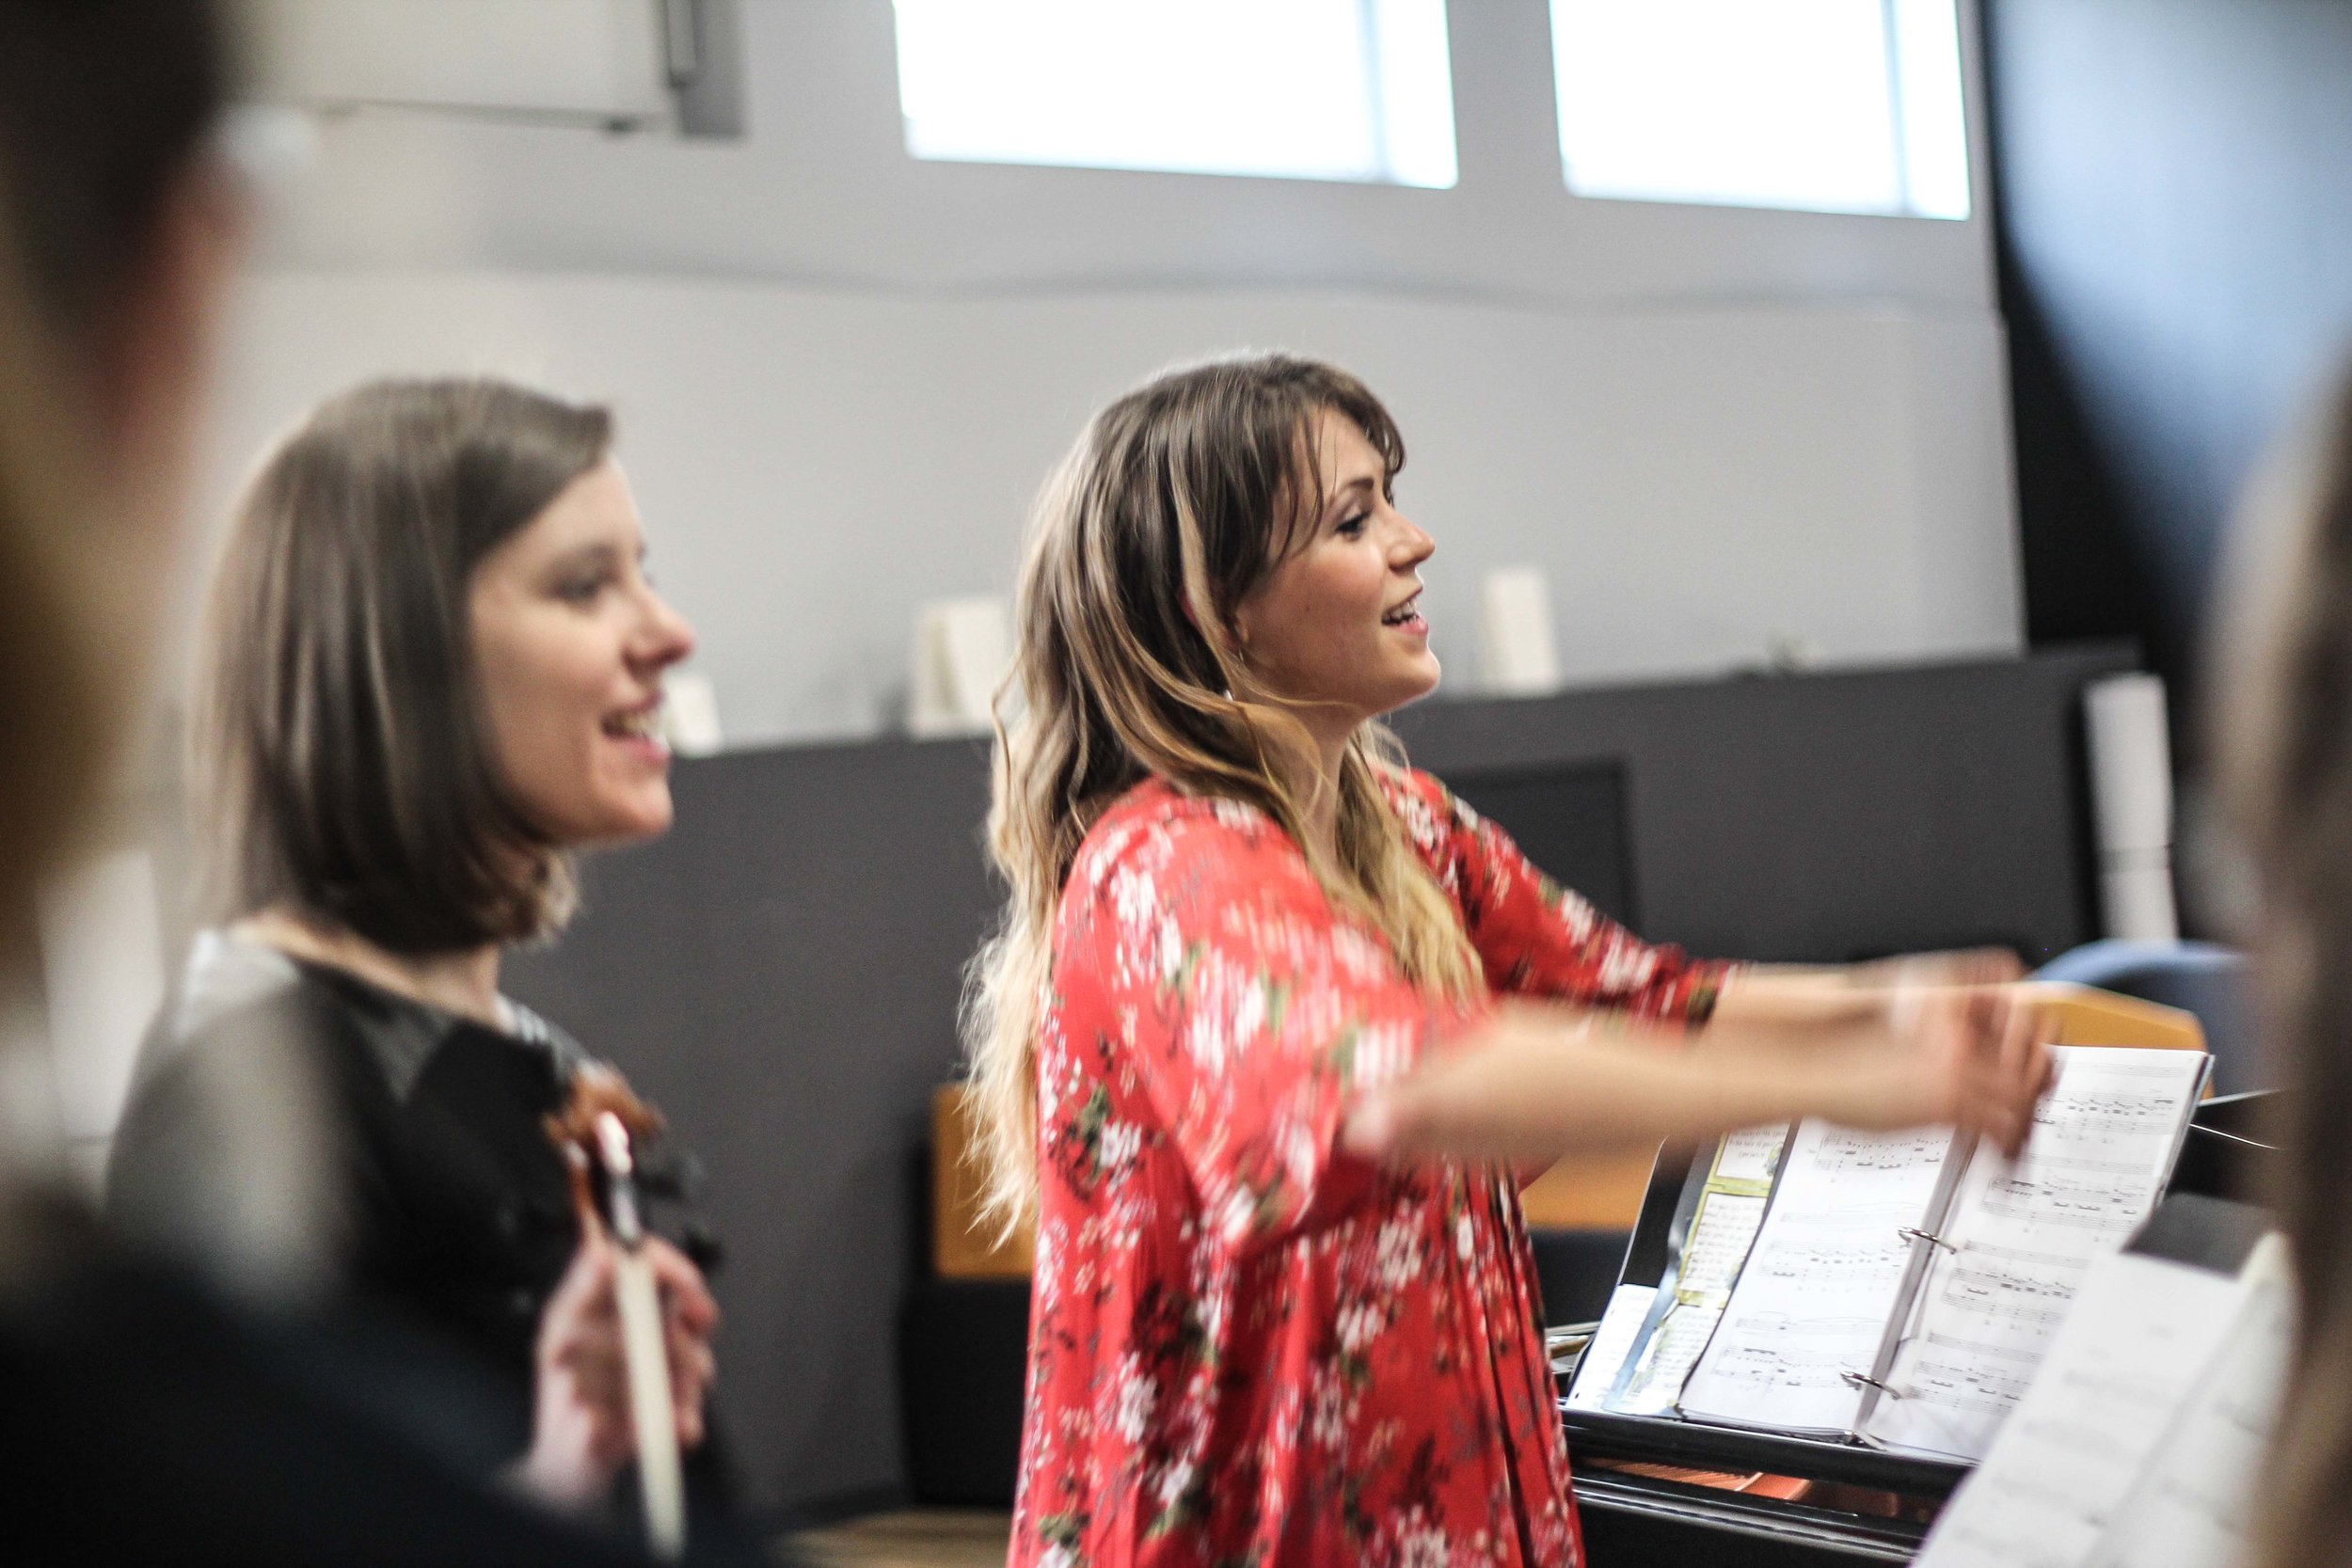 with violist Deanna Anderson masterclass at La Côte International School Aubonne, Switzerland